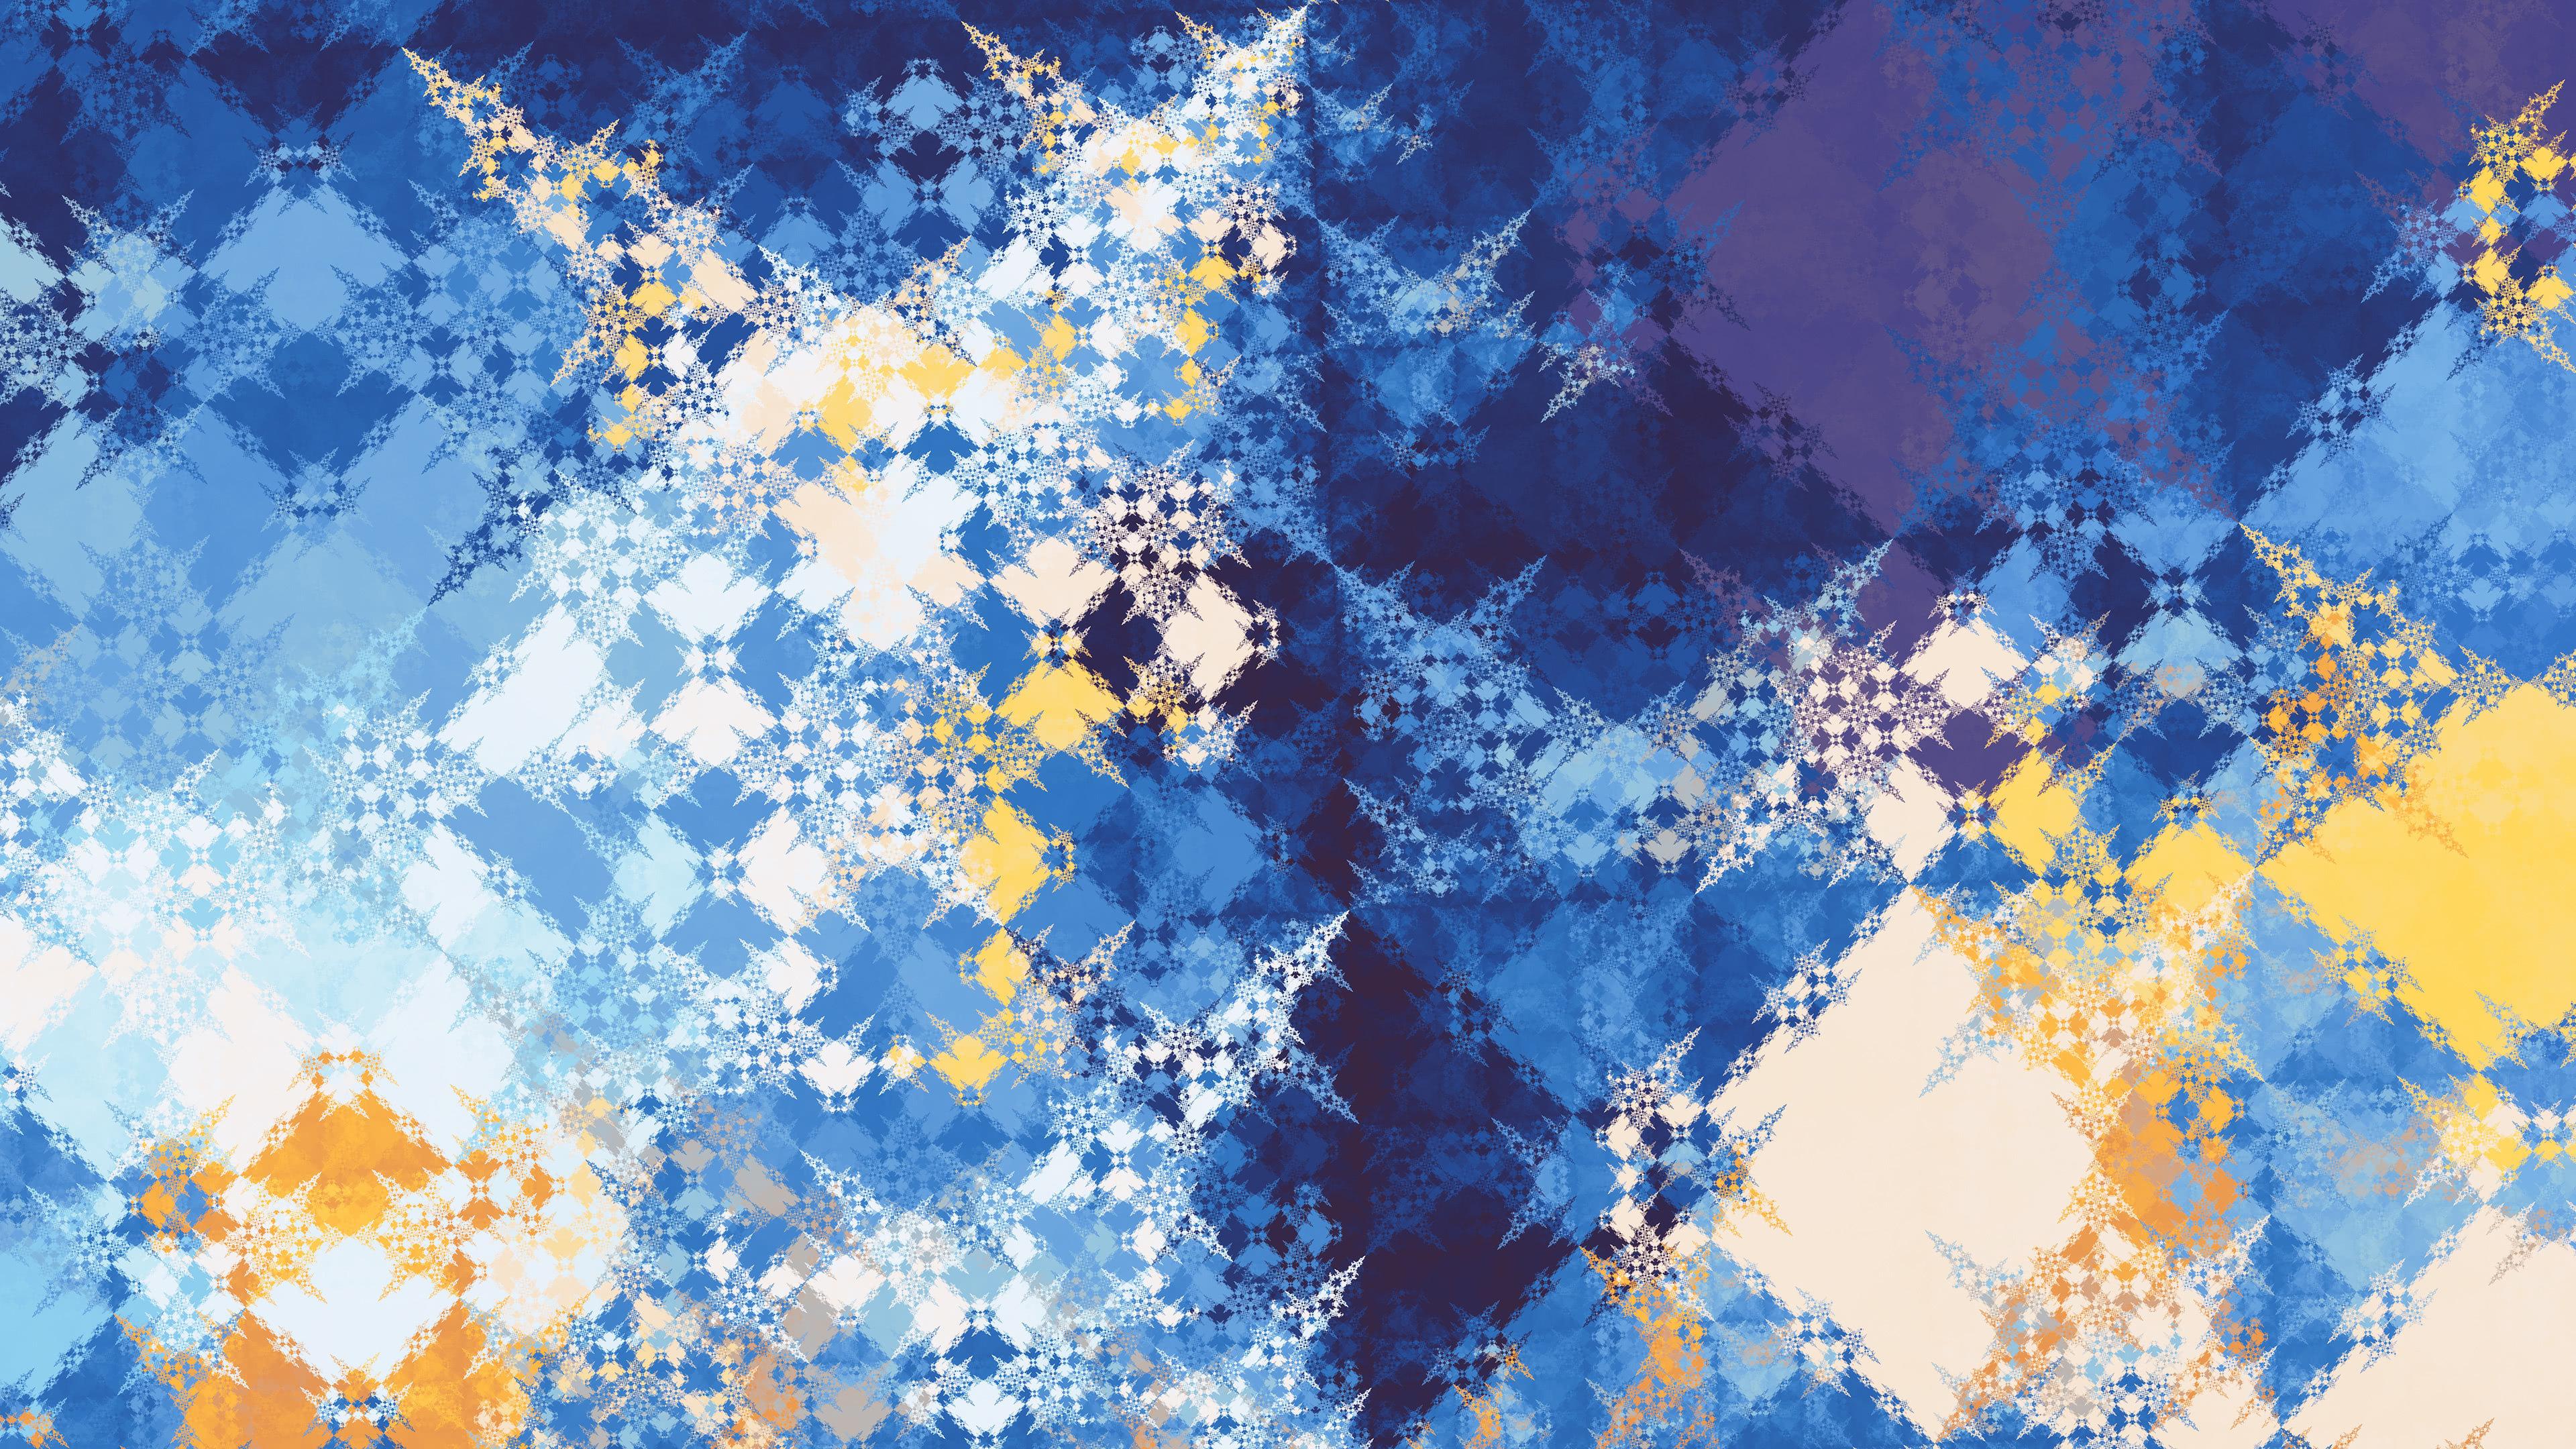 abstract fractals uhd 4k wallpaper